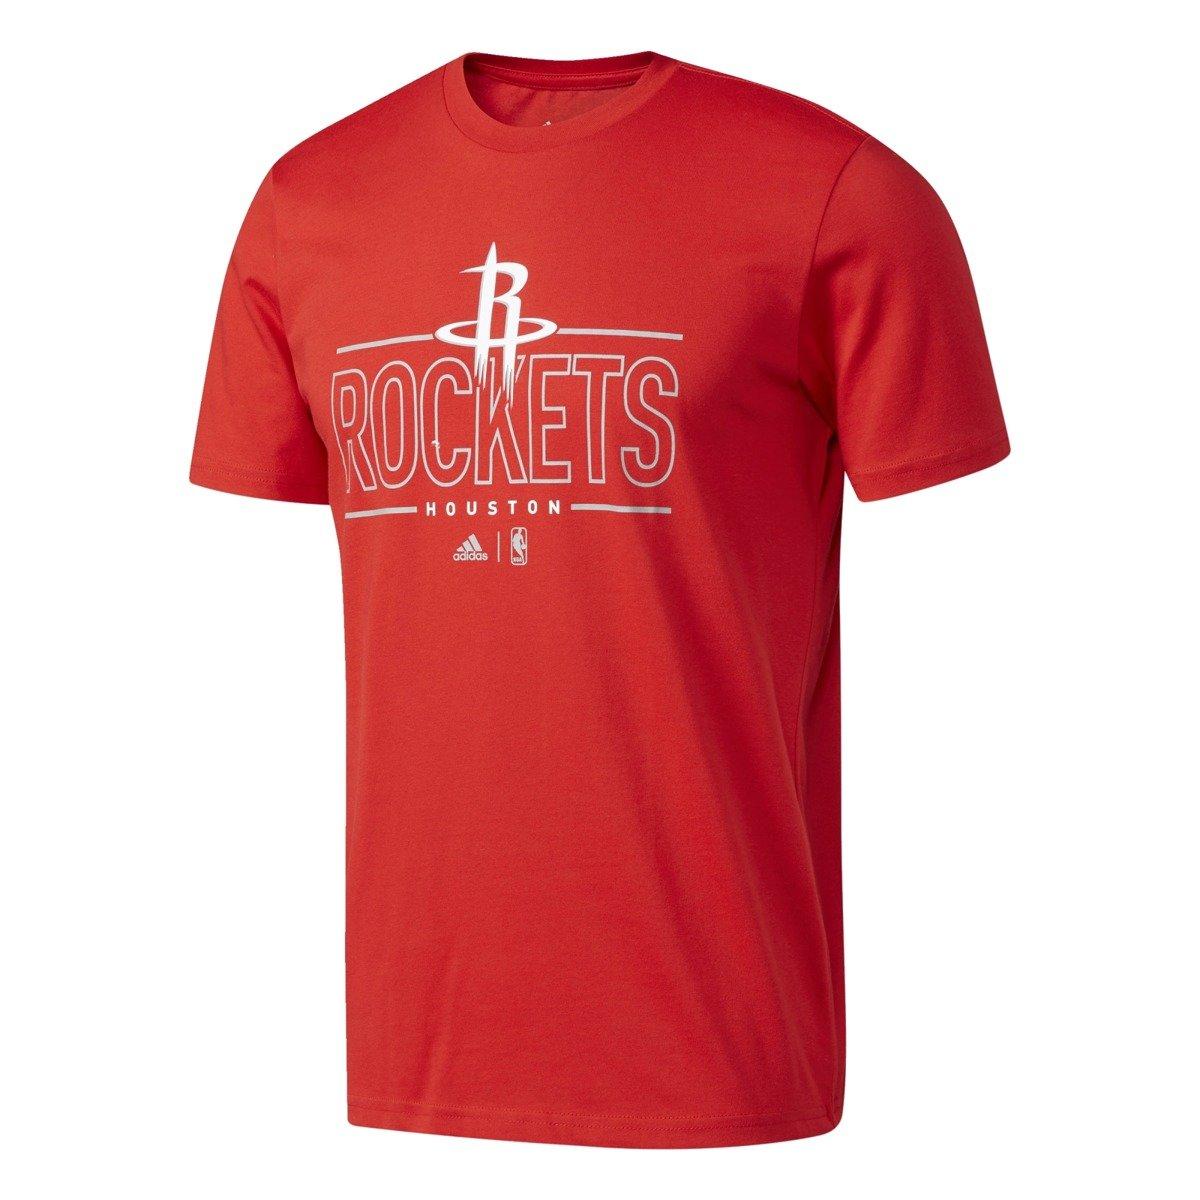 Adidas gfx 3 nba houston rockets t shirt s96788 for Nba basketball t shirts